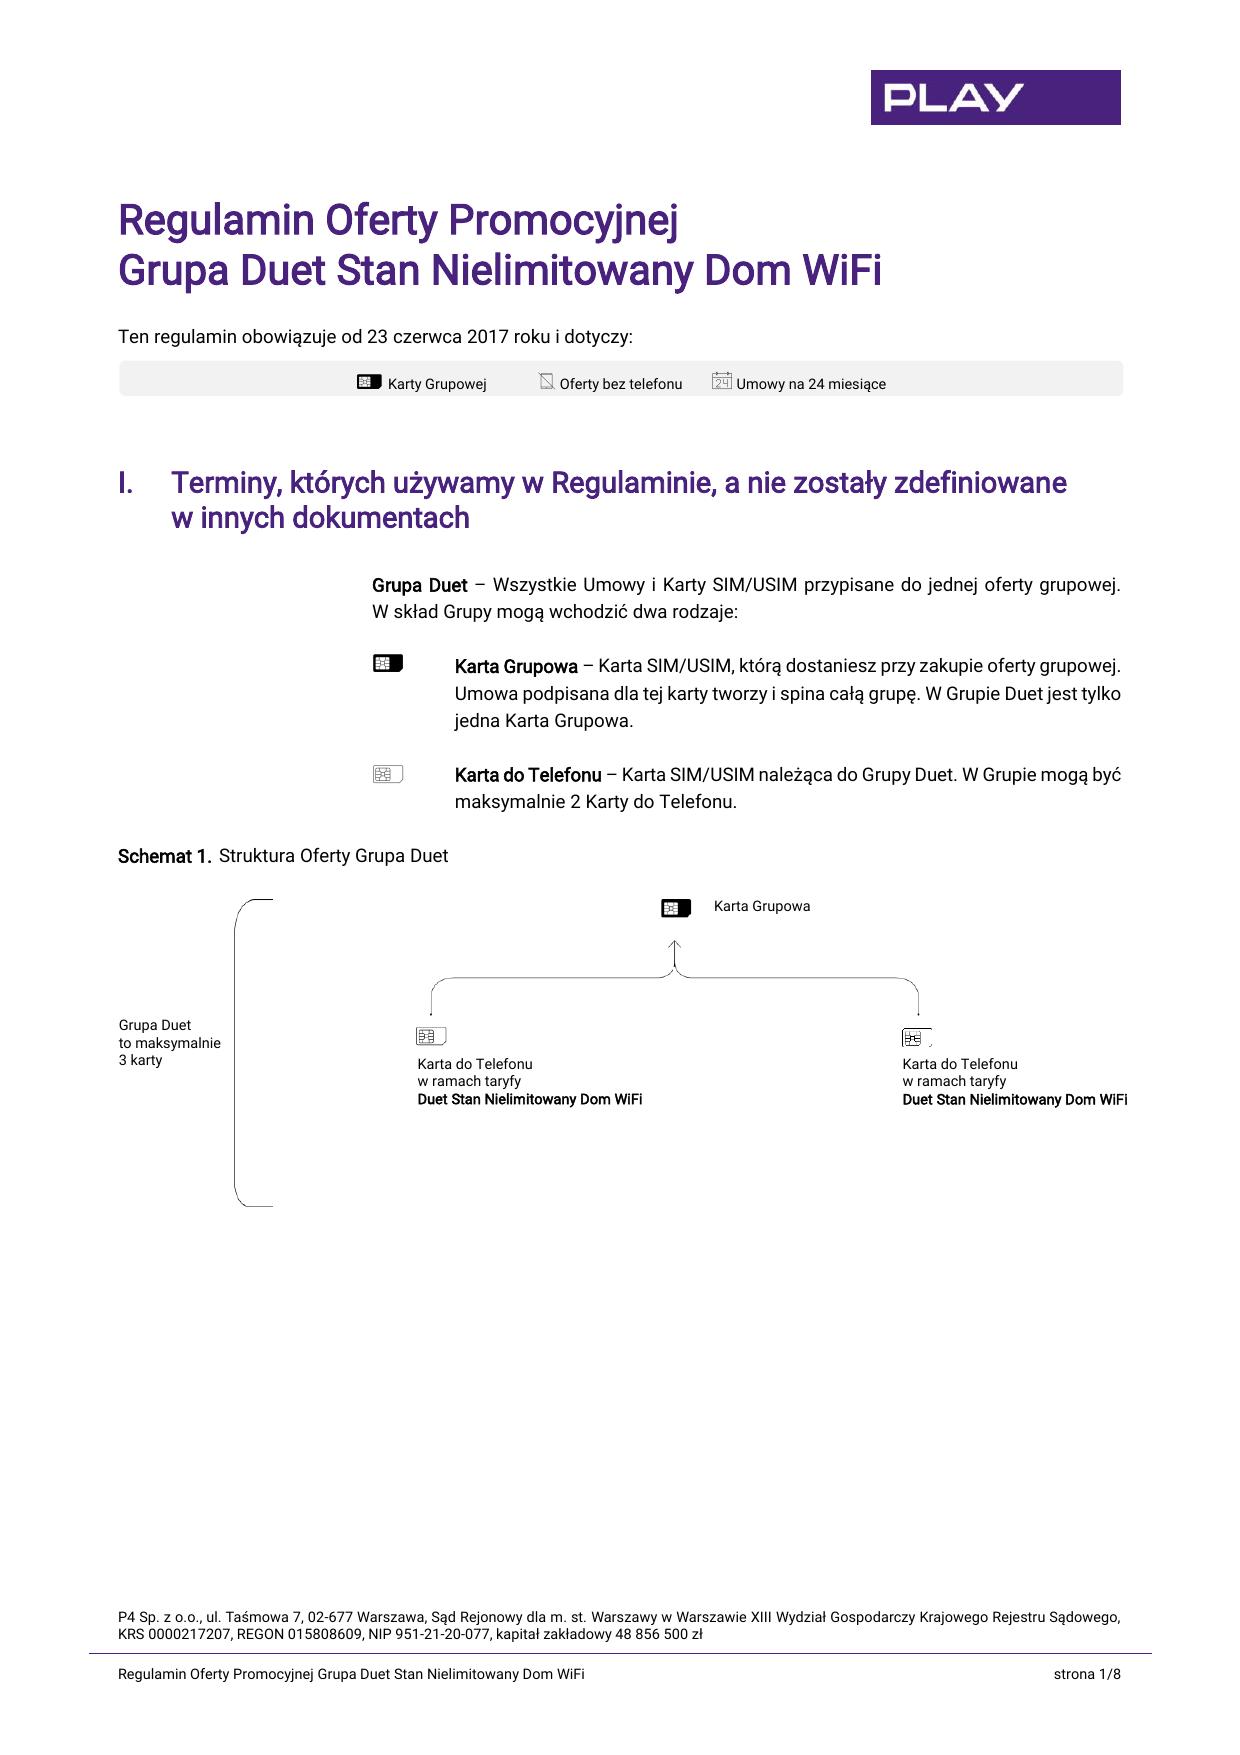 Regulamin Oferty Promocyjnej Grupa Duet Stan